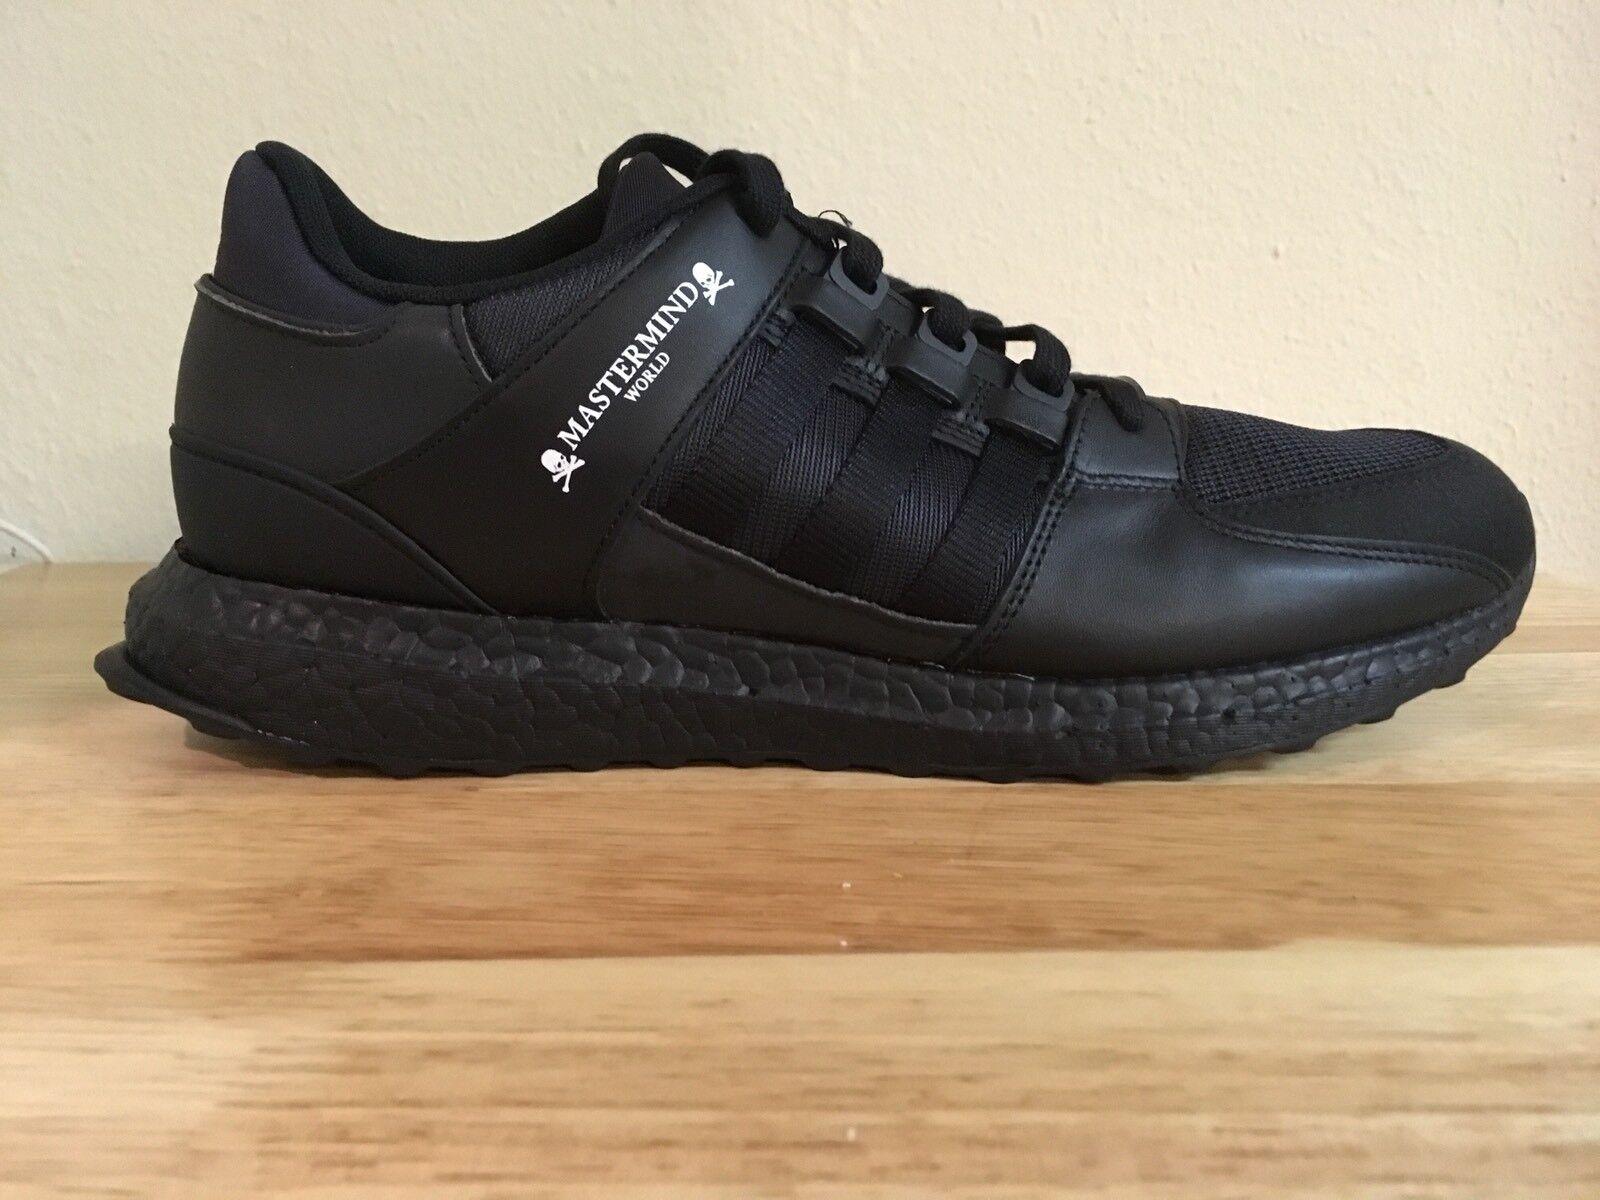 Custom Triple Black Adidas Mastermind World EQT Support Ultra US 11 CQ1826 Boost